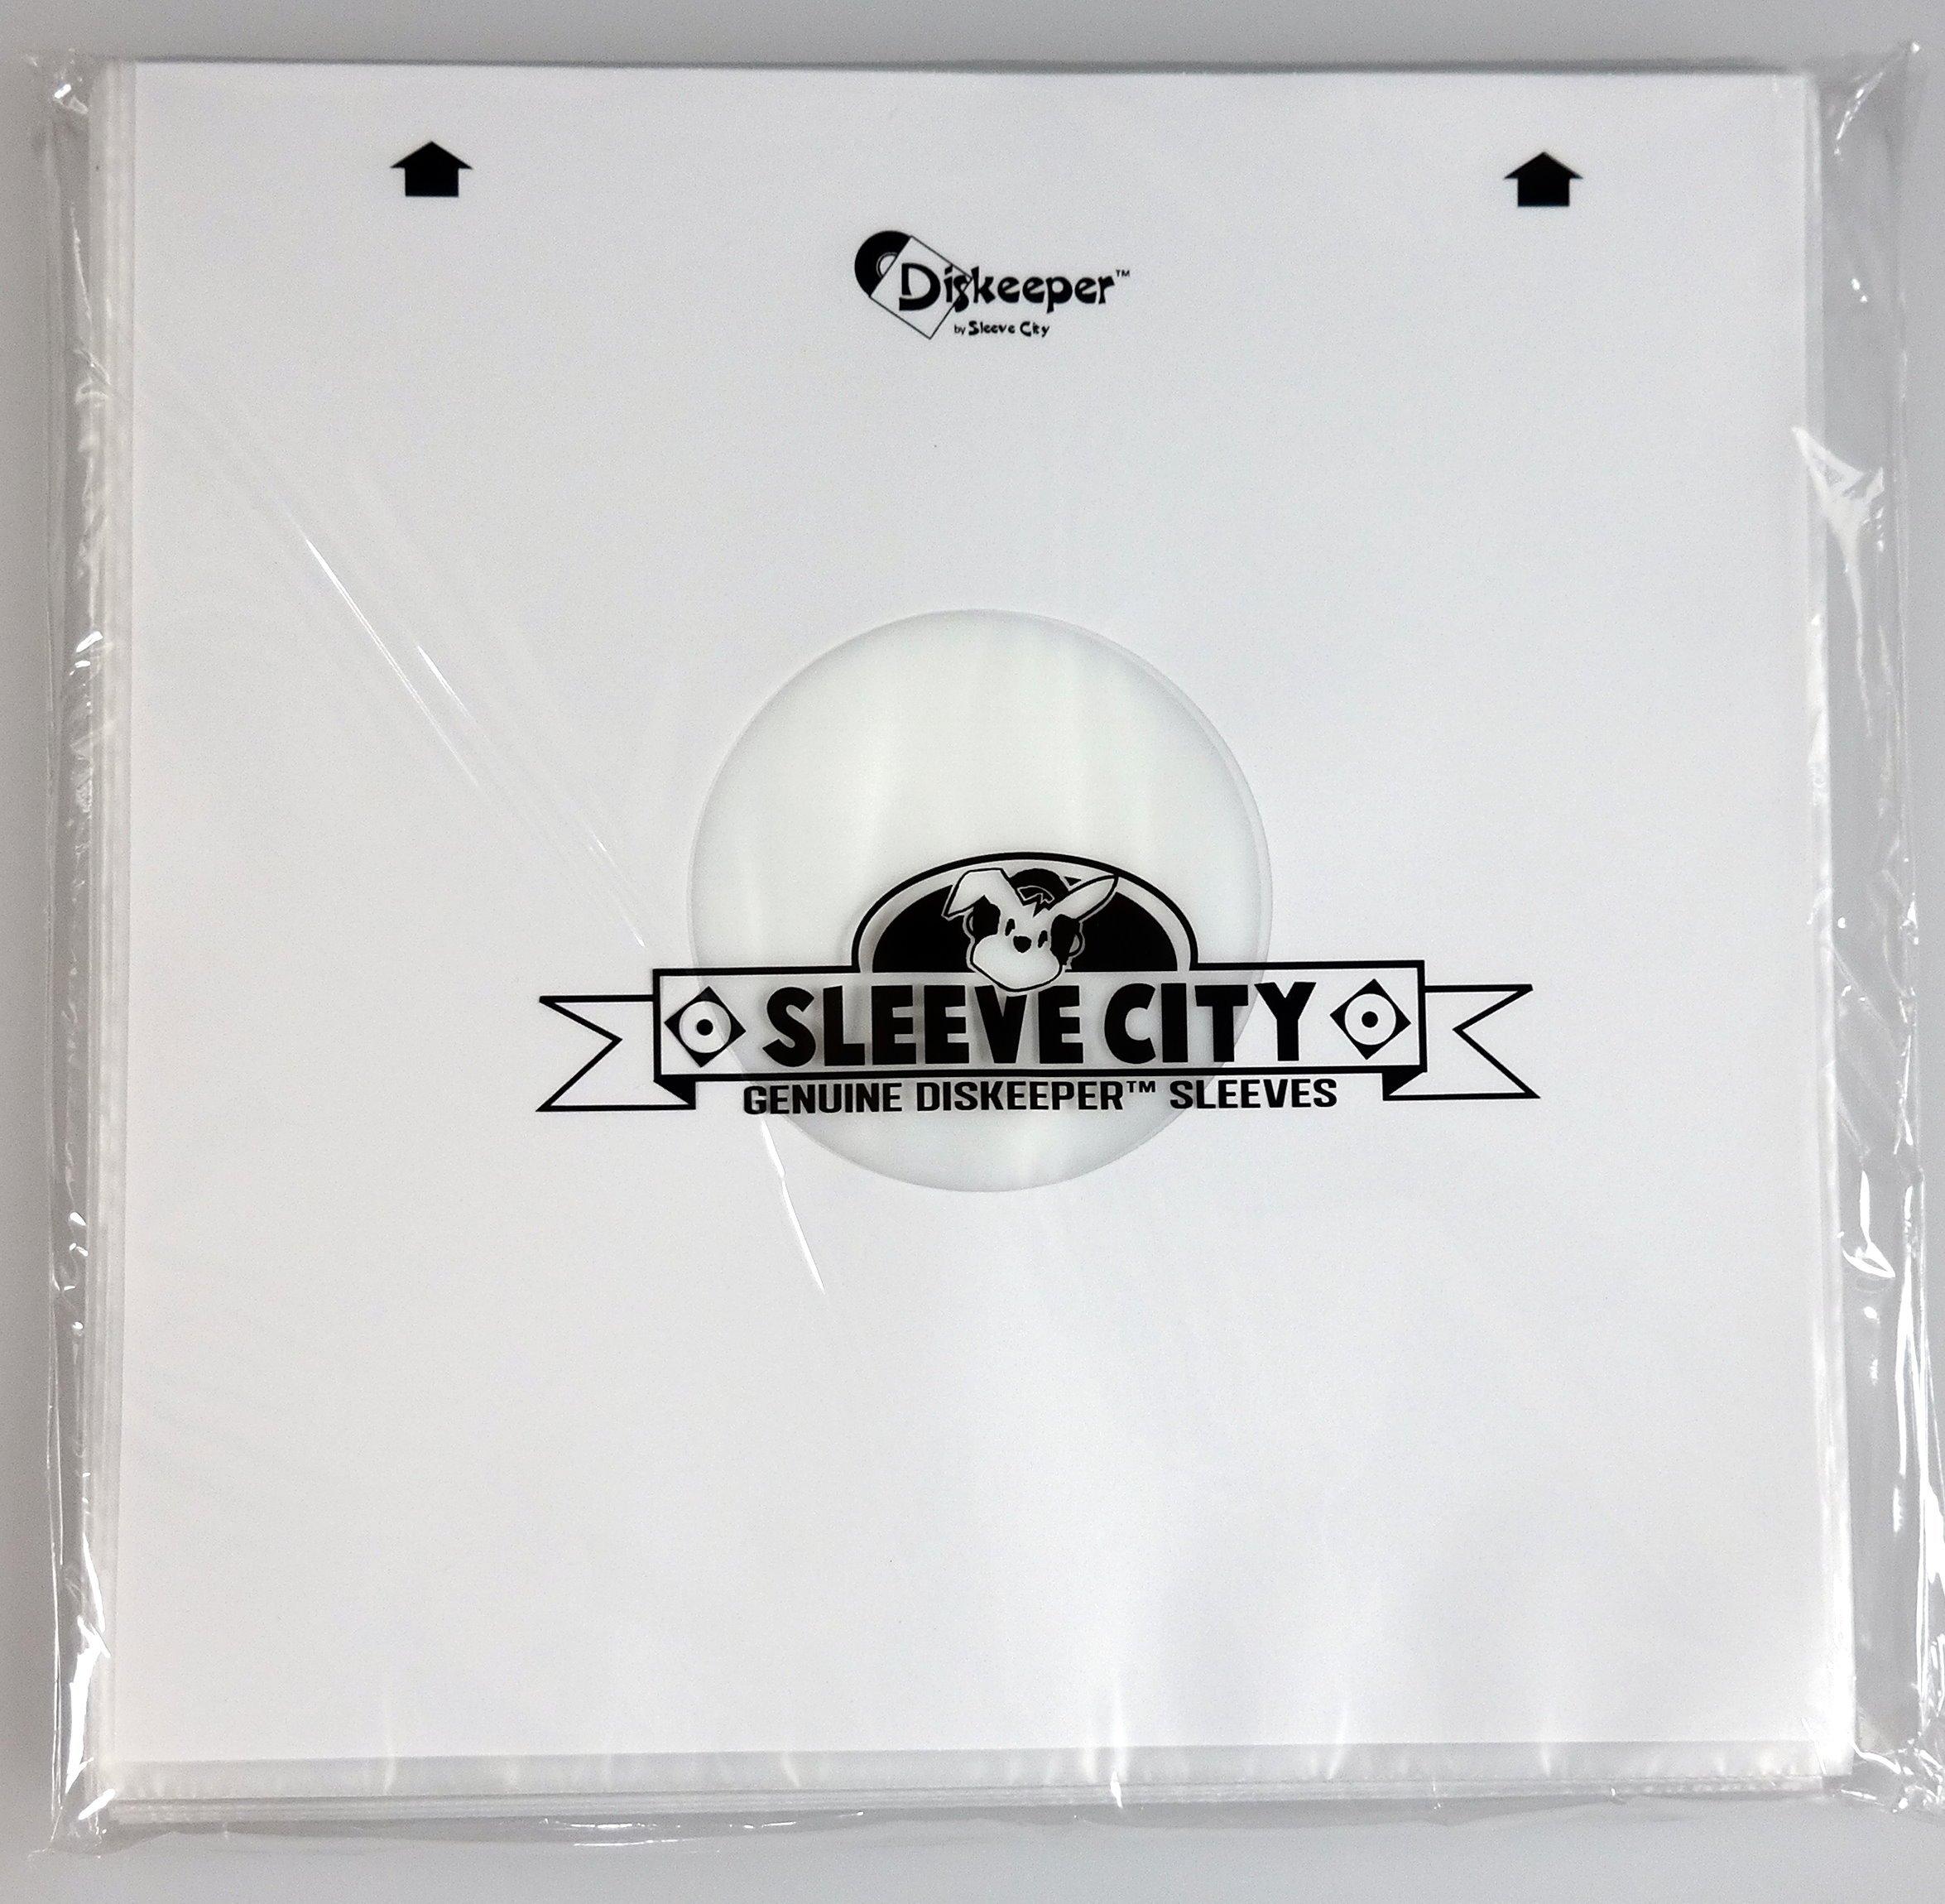 Diskeeper Ultimate Audiophile Inner Record Sleeves by Sleeve City(50 Pack)